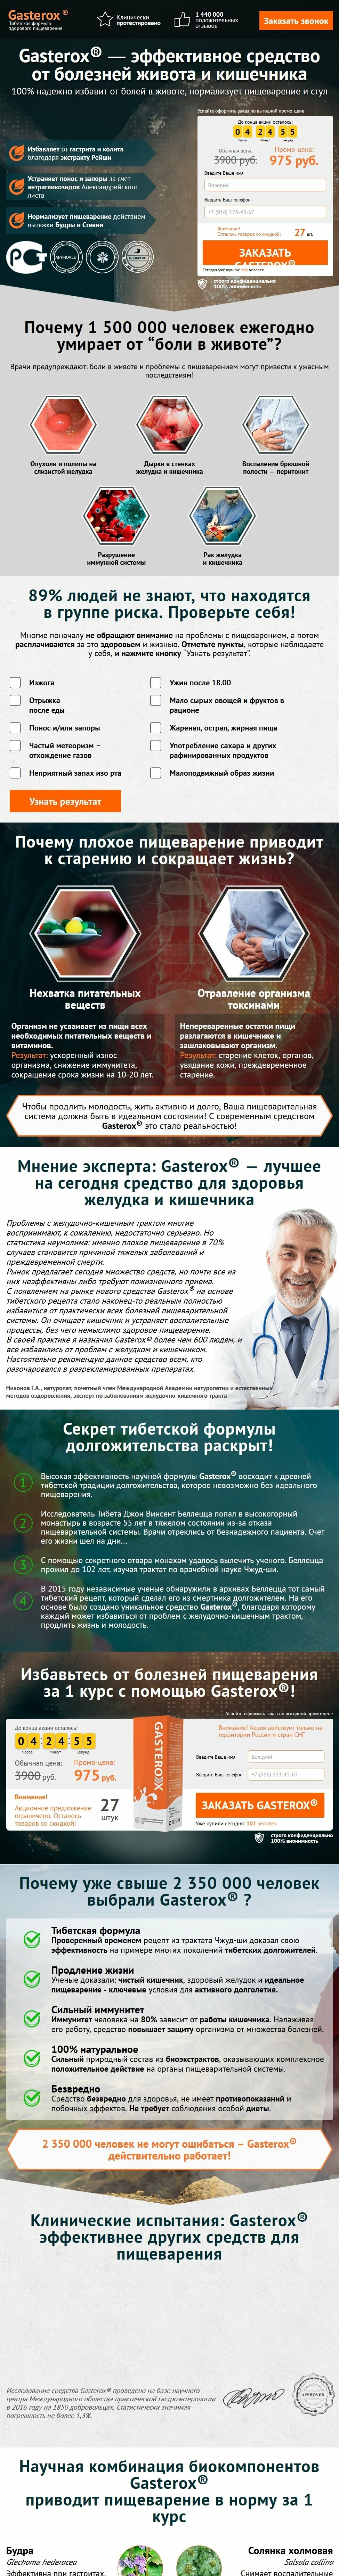 Gasterox от болезней живота и кишечника в Елеце